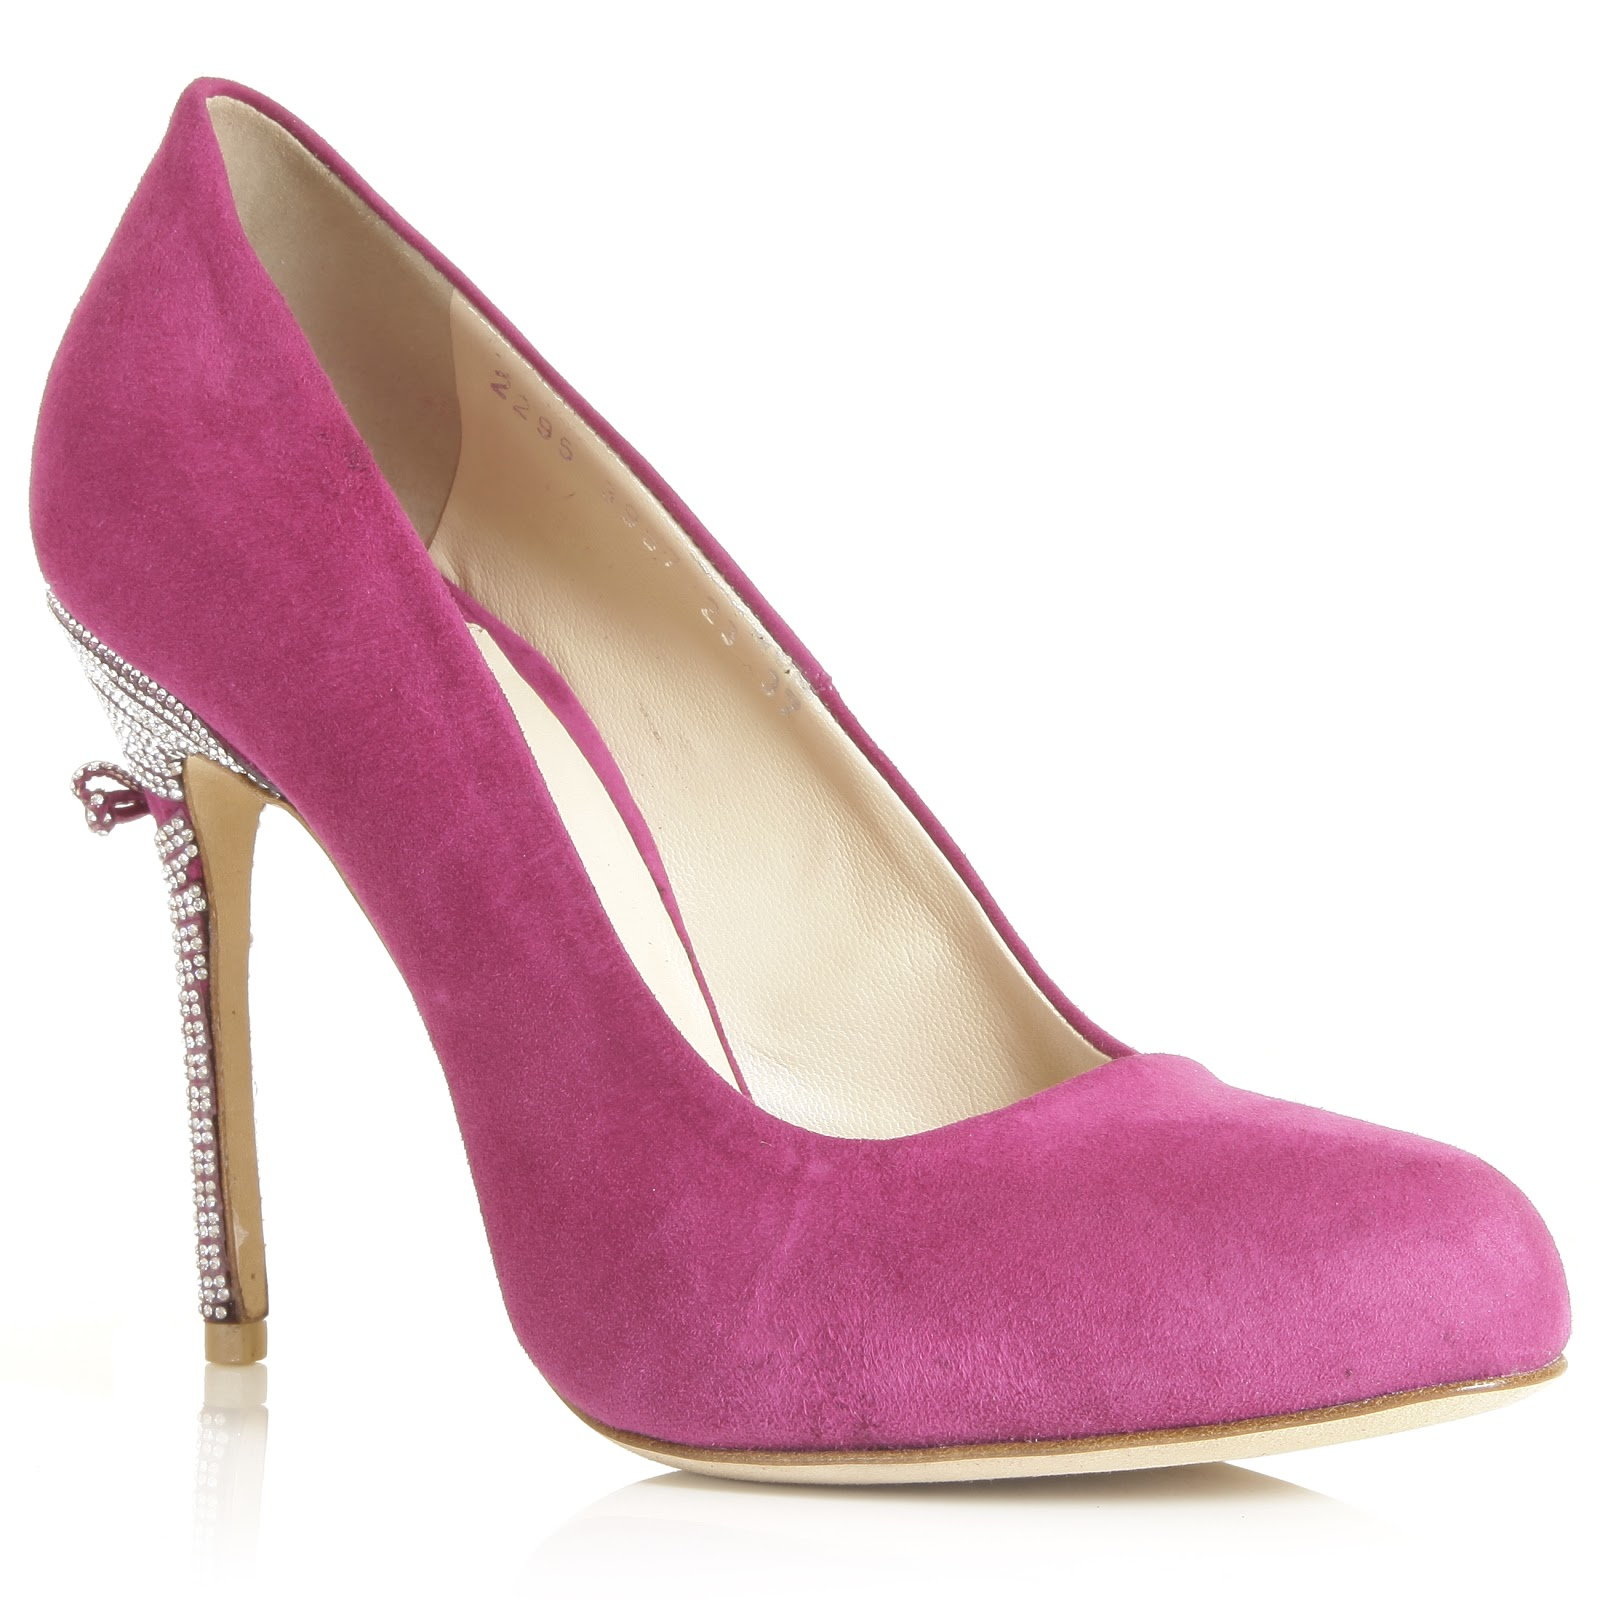 4e38b5cad81 Shoeniverse: 2012-10-07